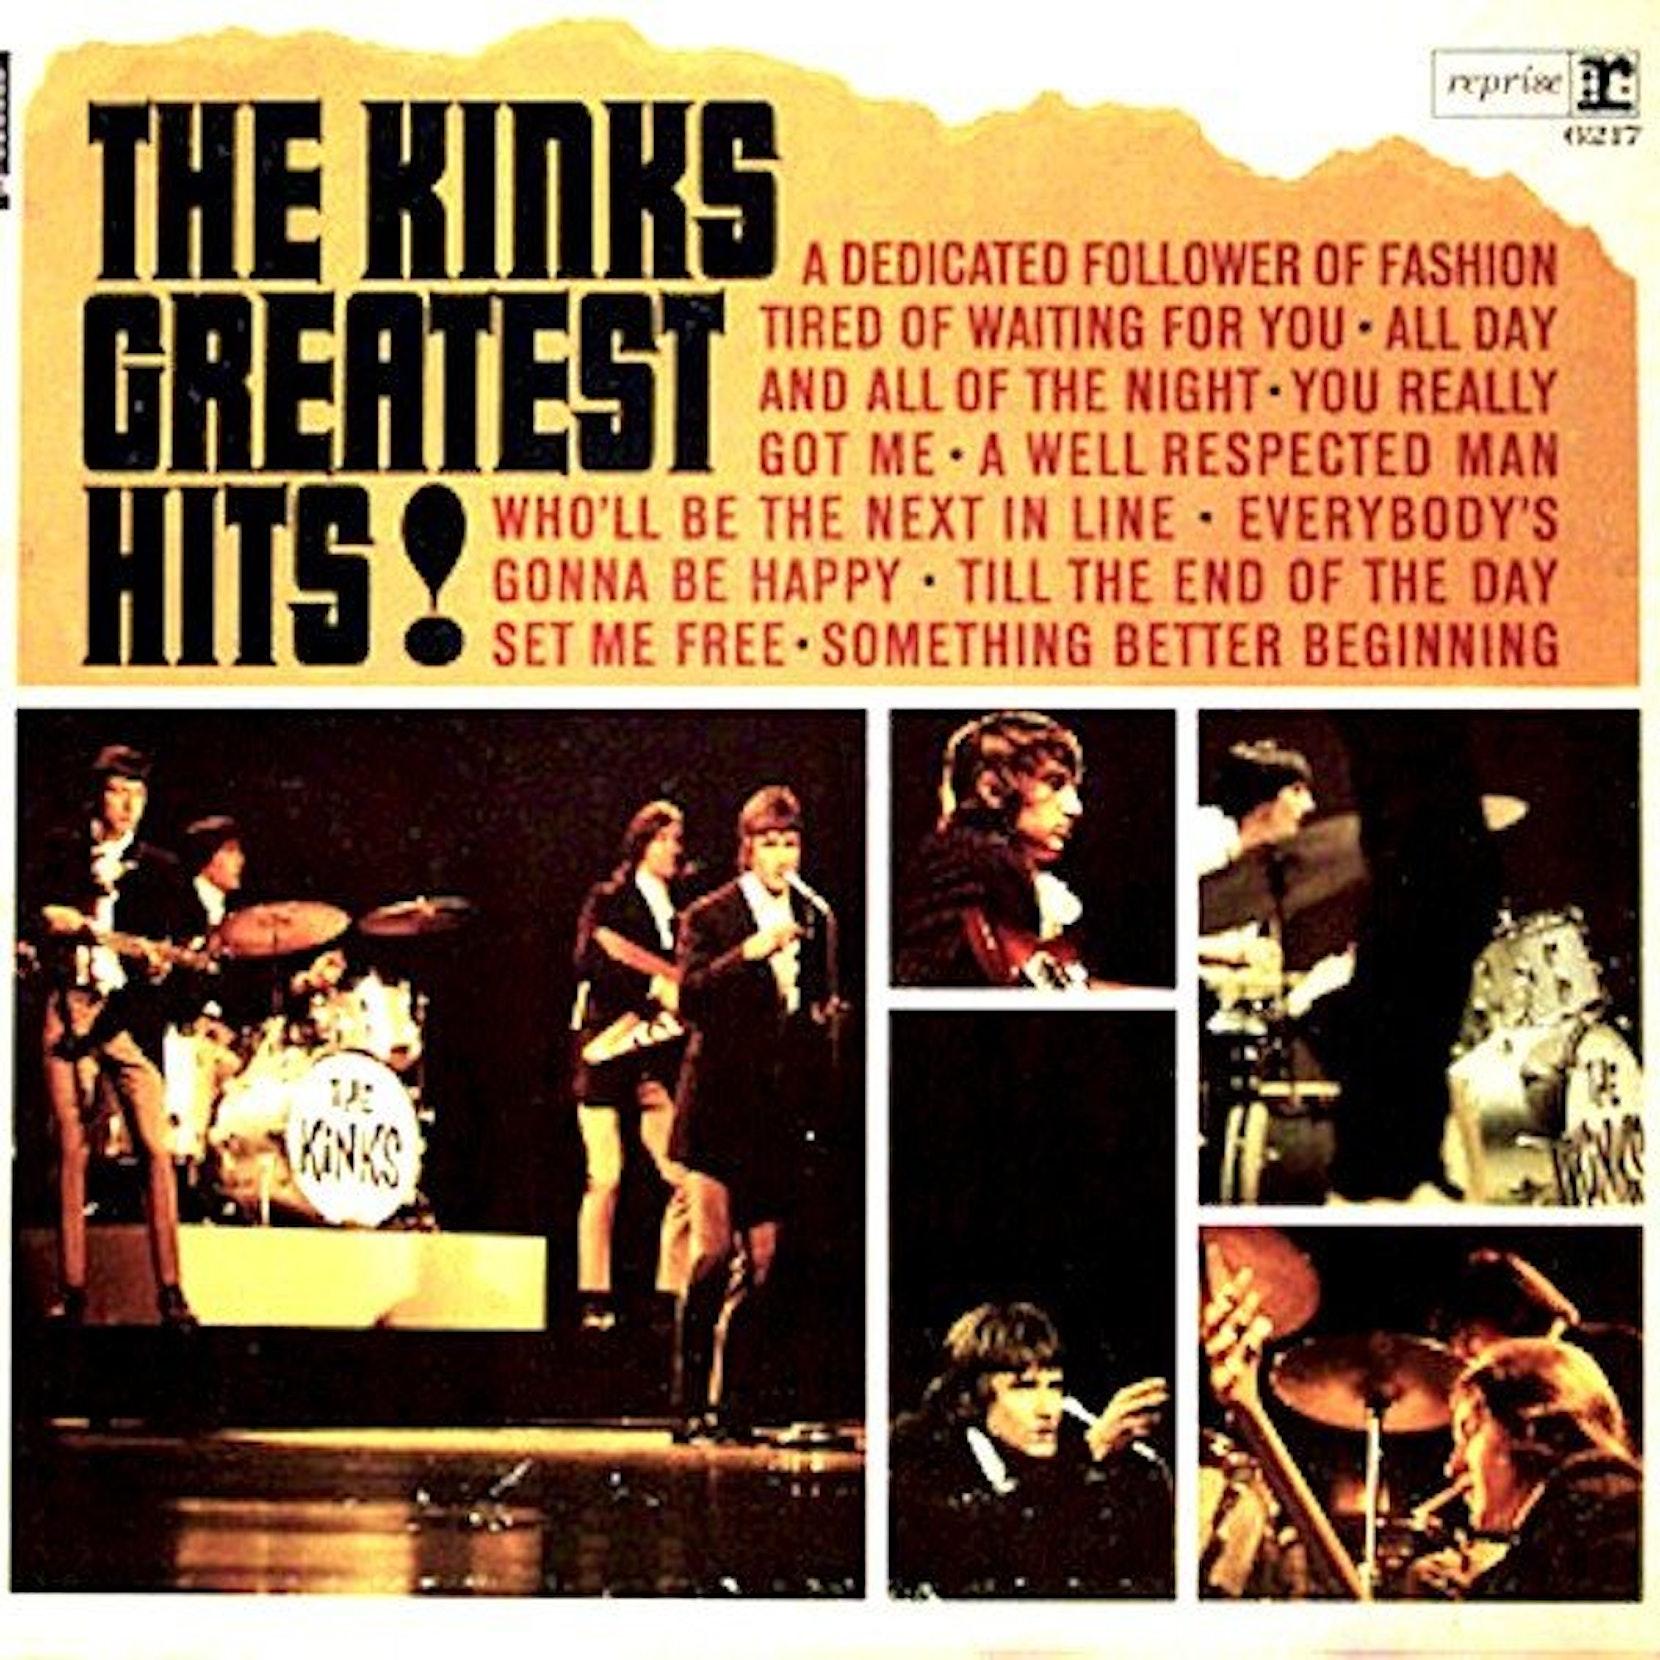 the 10 best kinks albums to own on vinyl vinyl me please